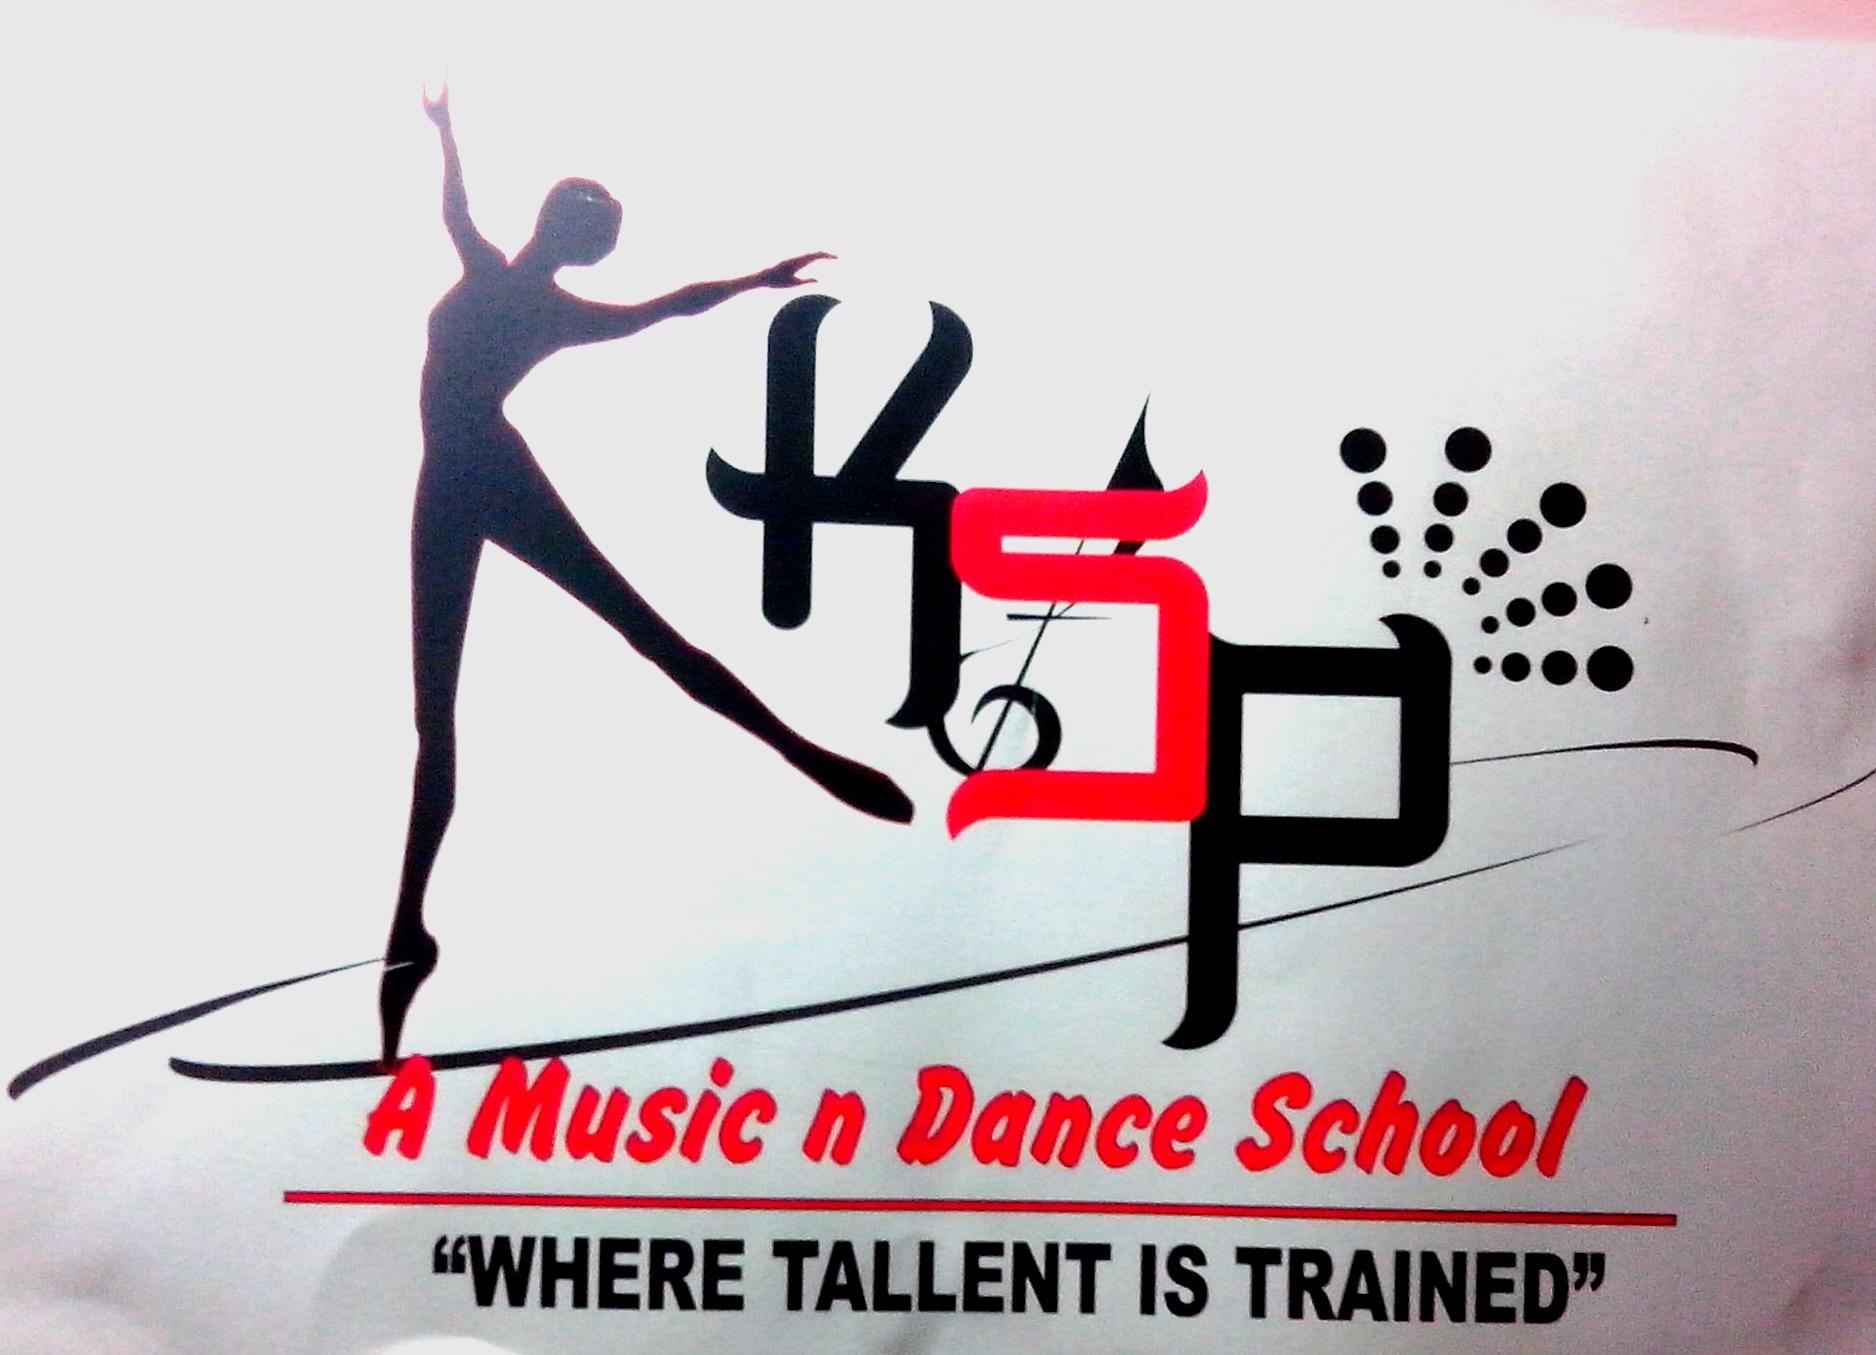 Kashyap Music & Dance School